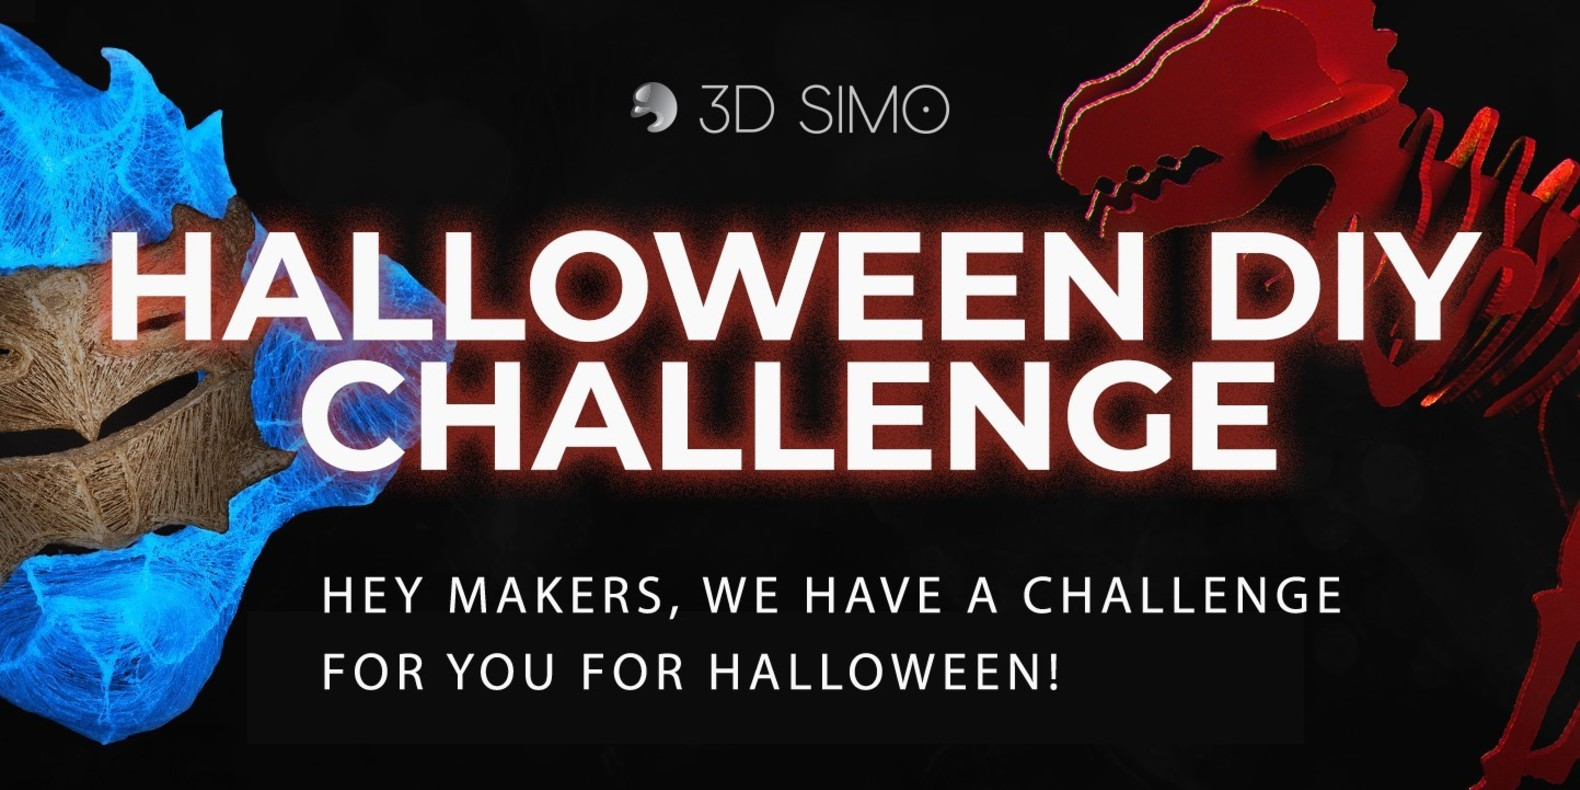 3D Simo Halloween 3D printing DIY contest